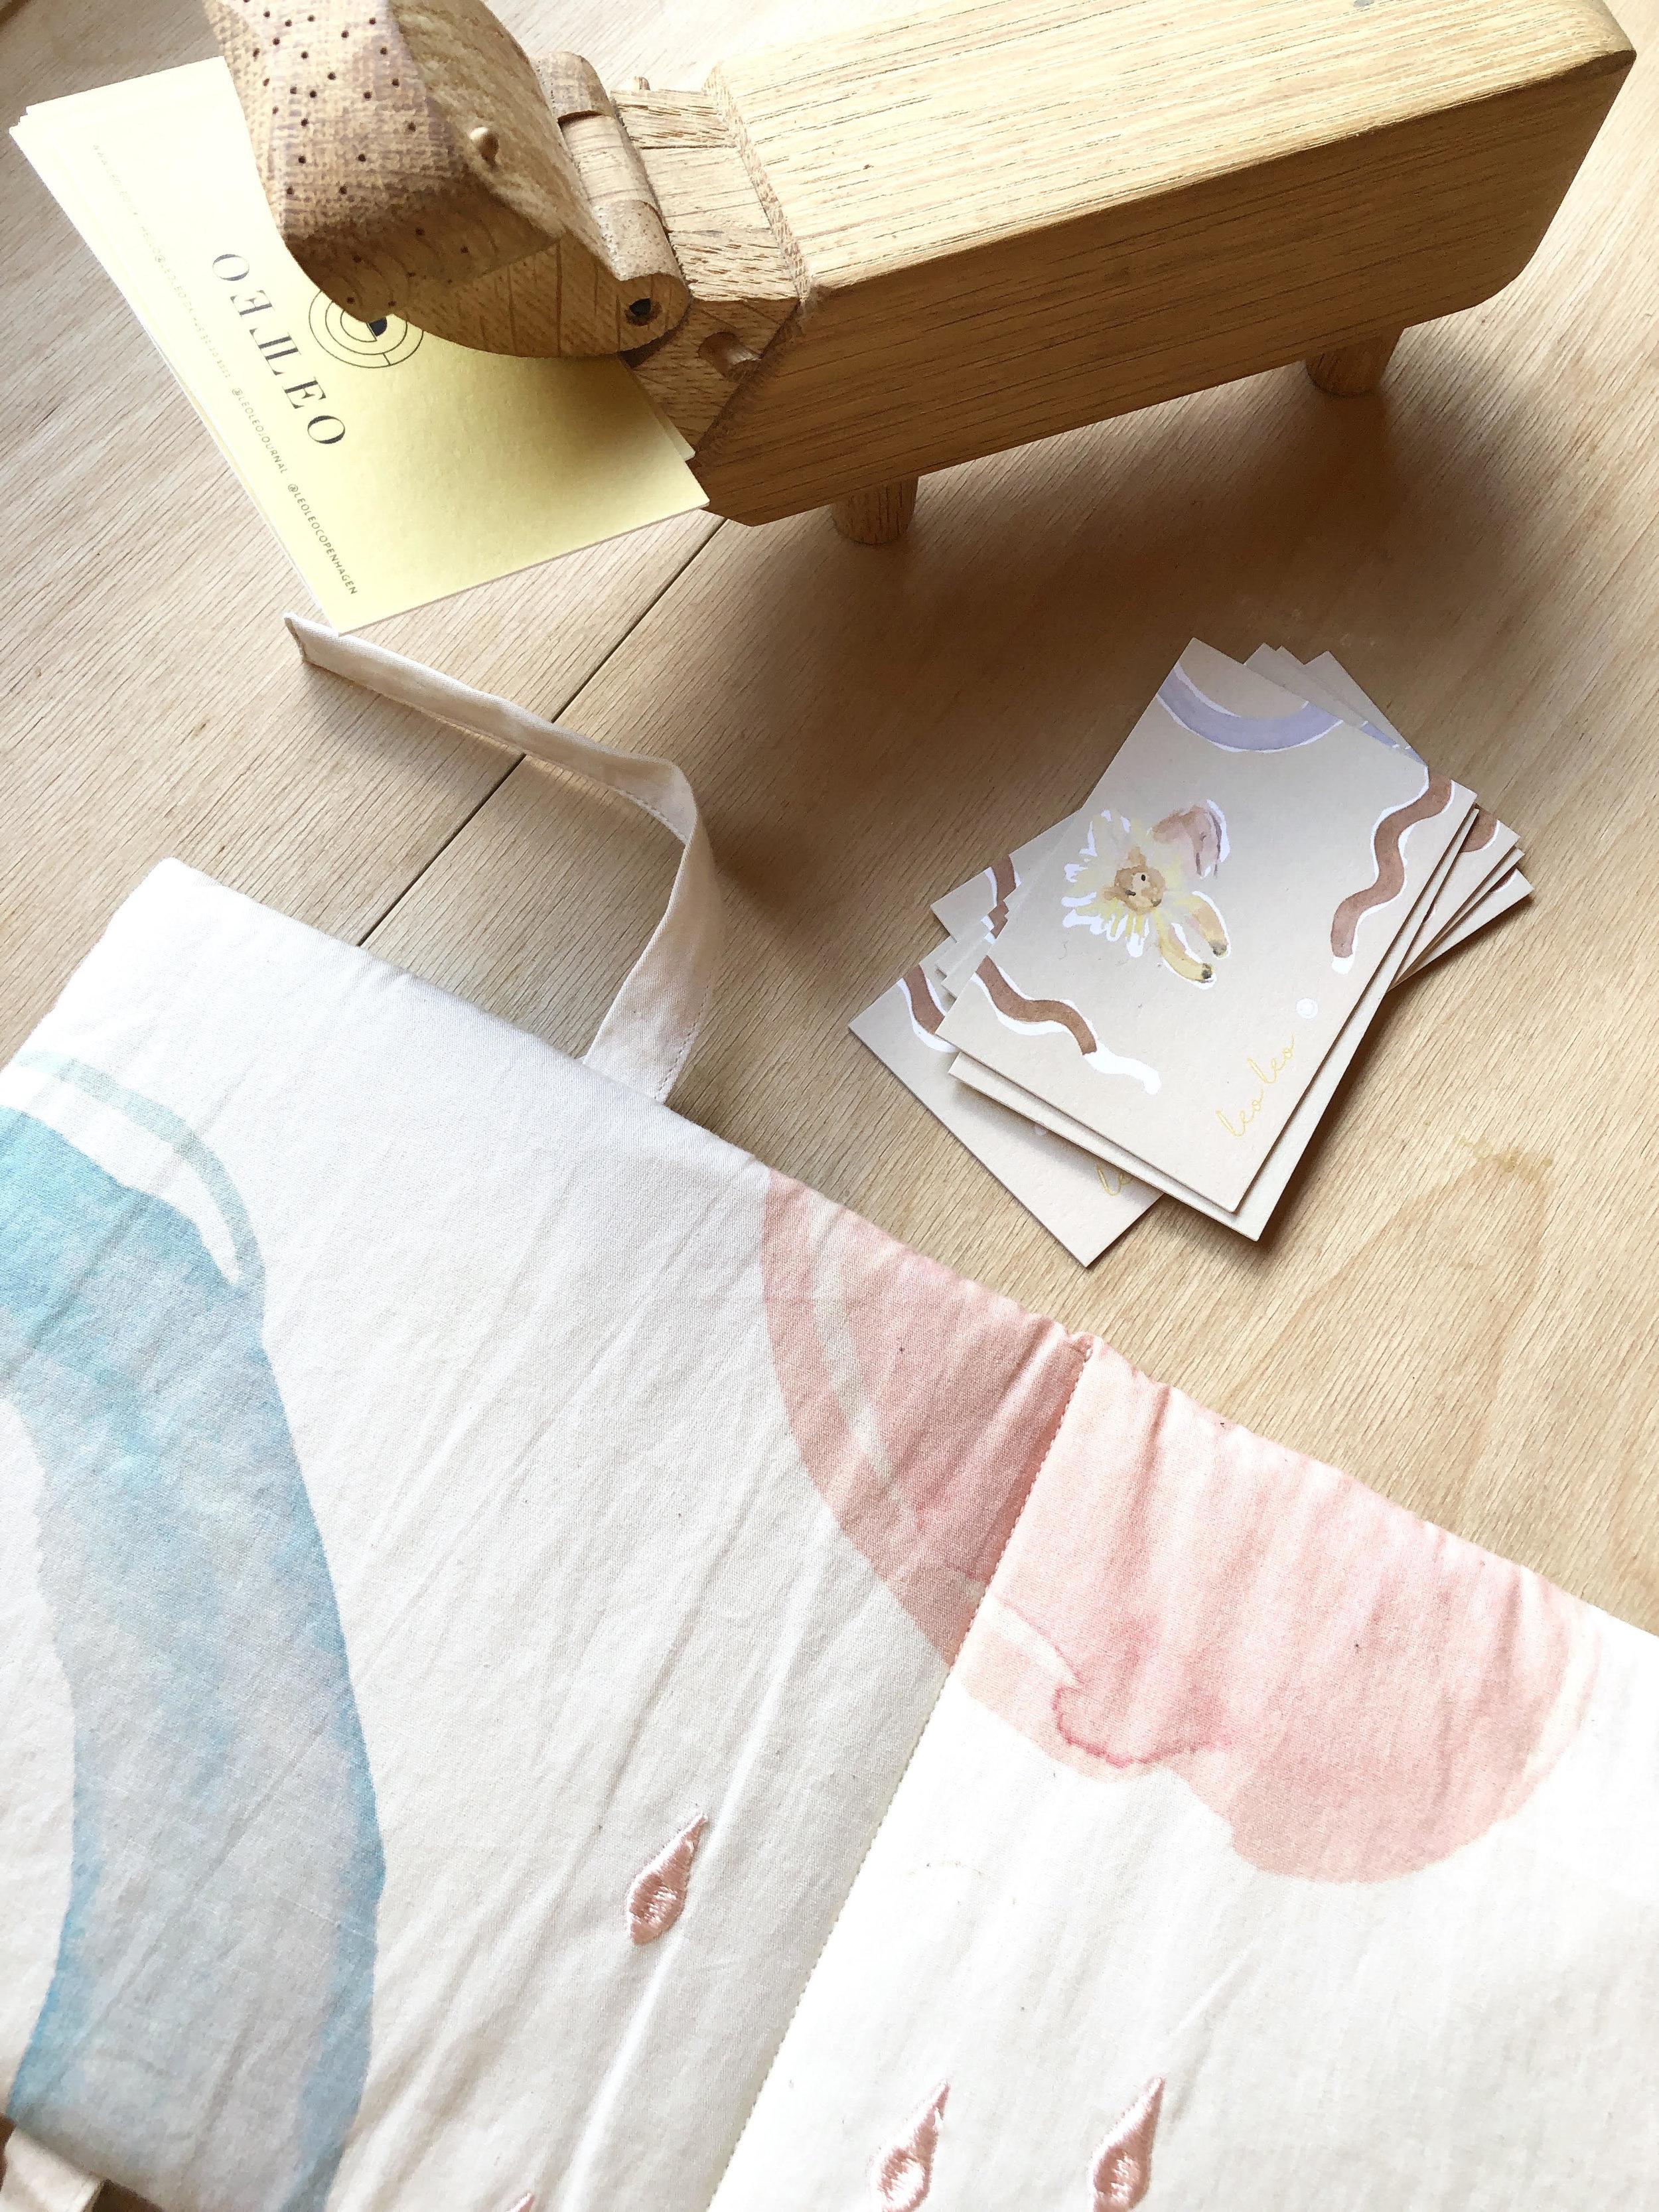 Fabric book from Leo Leo.